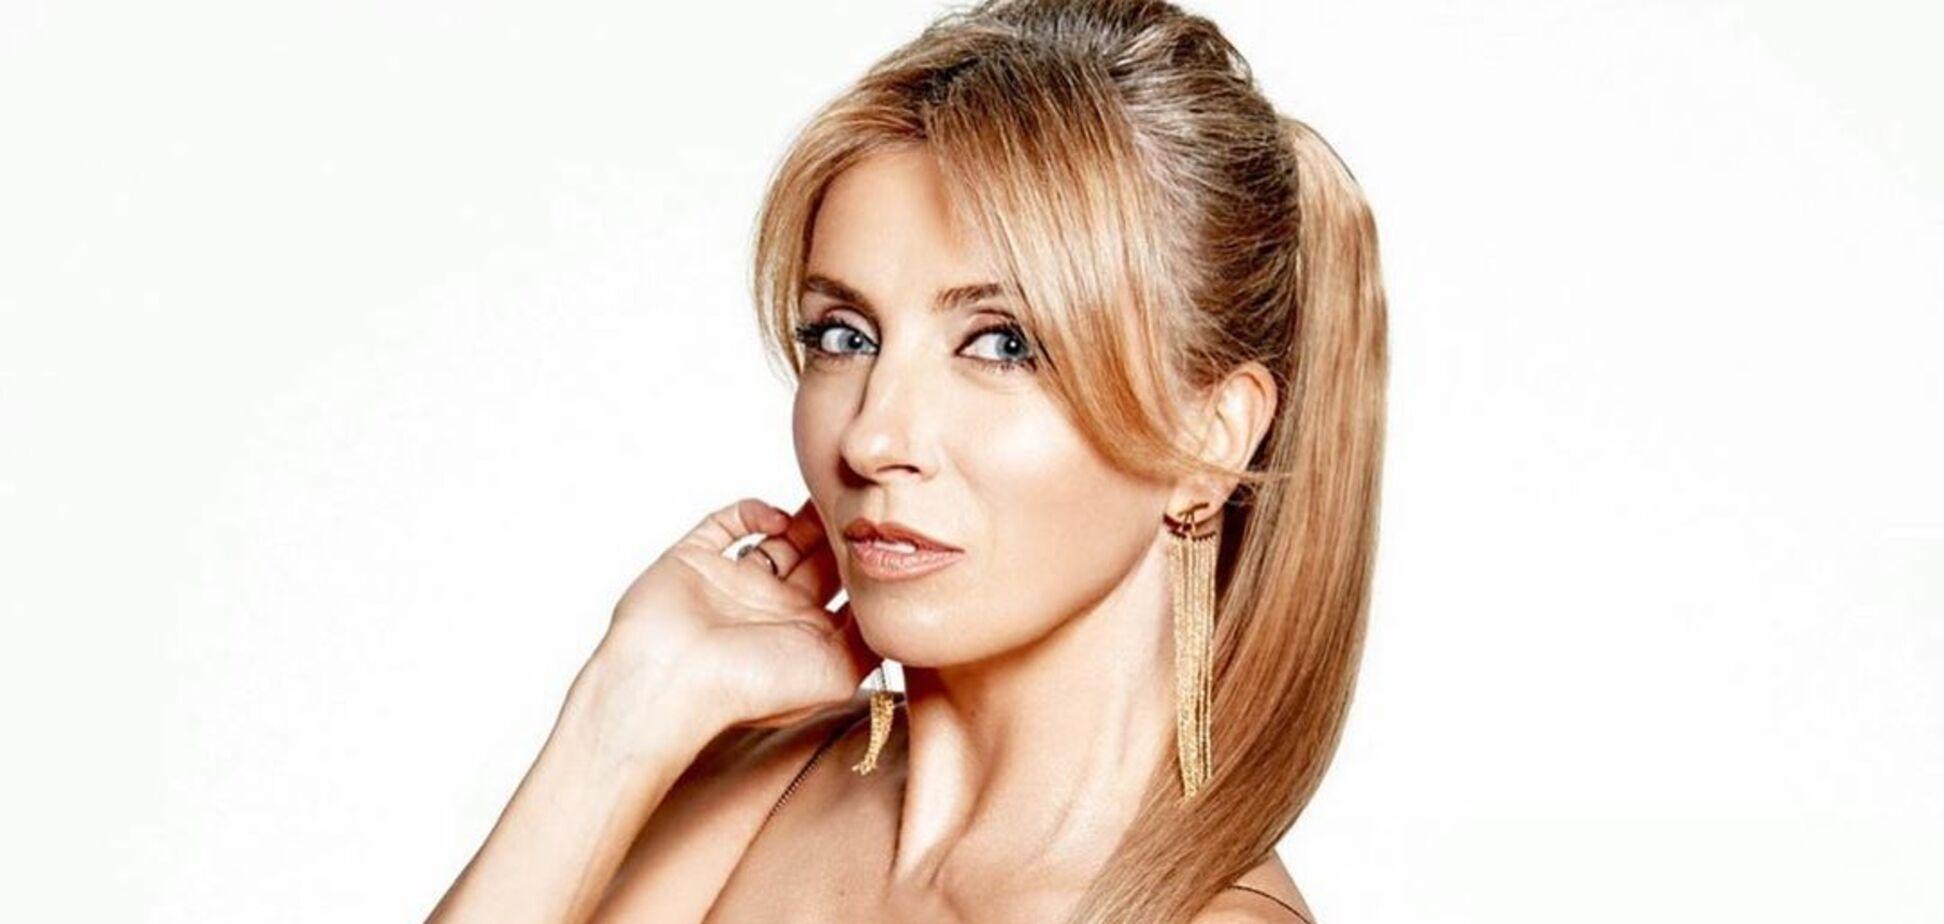 Экс-жена Бондарчука показала стройную фигуру в боди